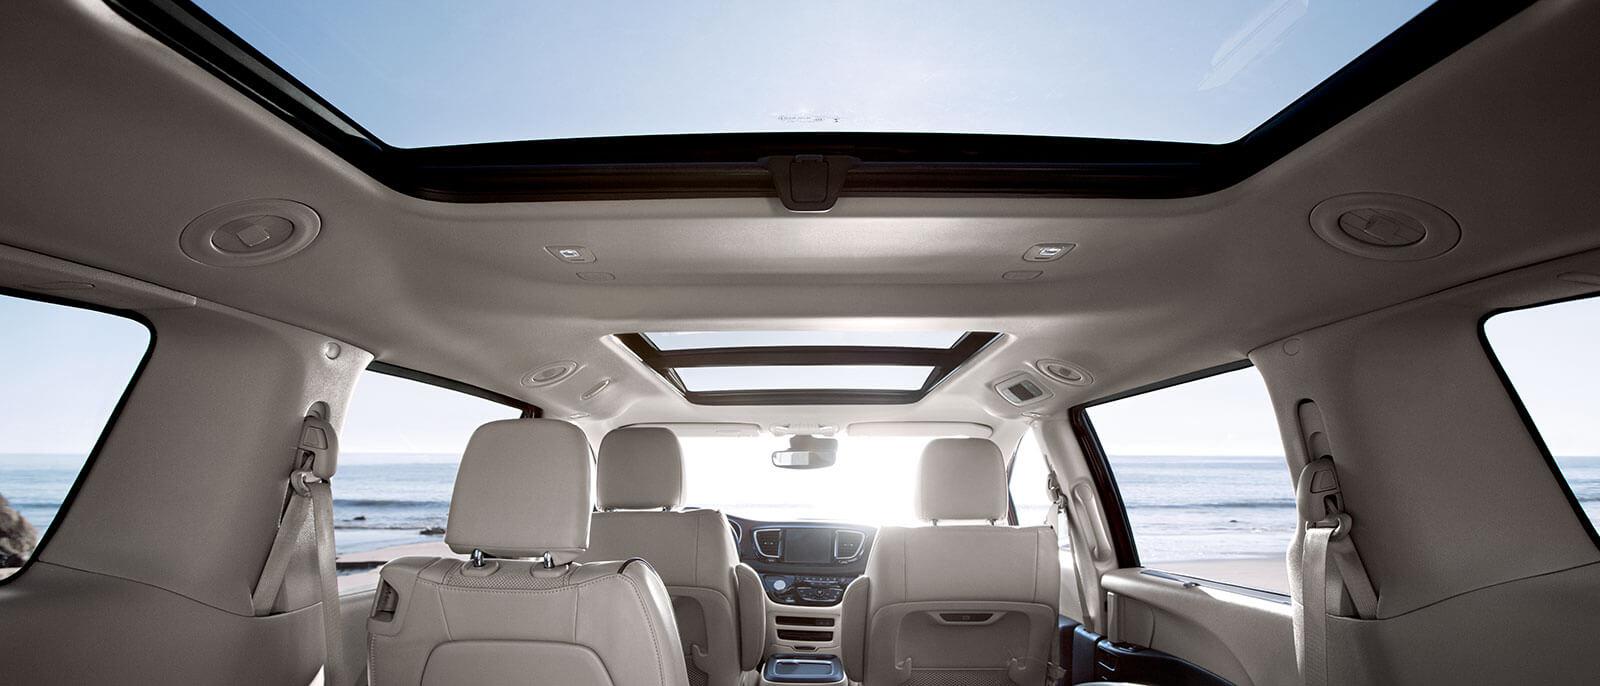 Clay Cooley Chevrolet >> Derrick Chrysler Dodge Jeep Ram New Chrysler Jeep | Autos Post